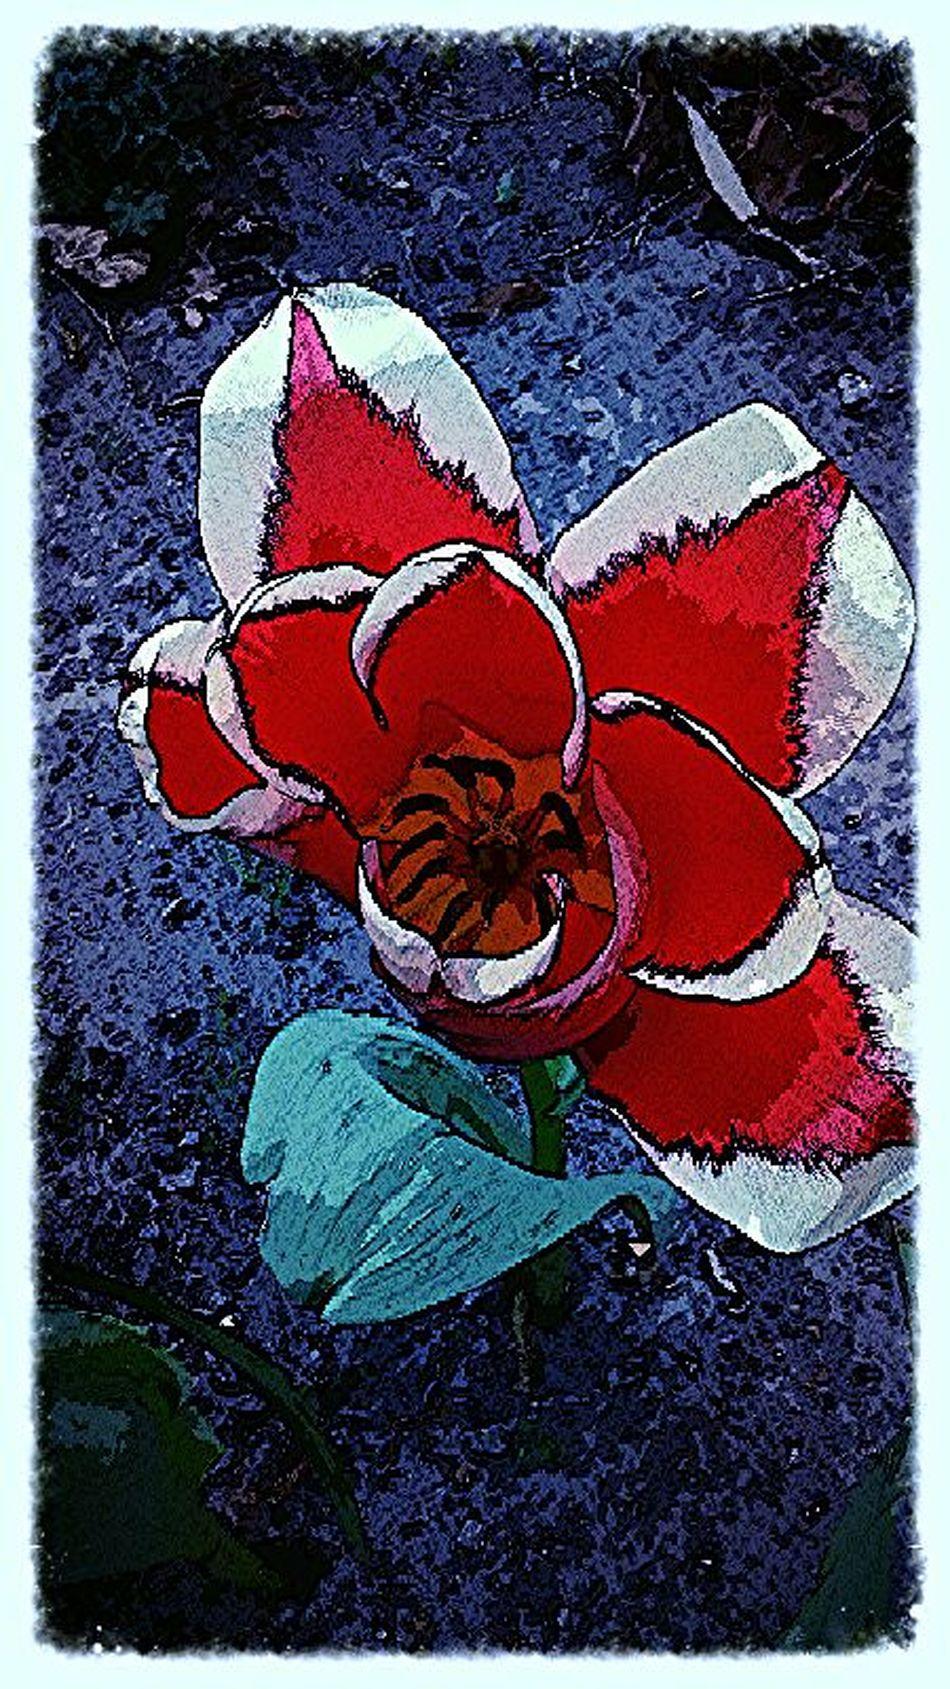 an old pic, new edit I hope you enjoy it. Taking Photos Heartflowers Instagram #followme #follow #eyeem #awesome #streamzoo #instahub #photo #sigueme #followhim #cute #follow4follow F4f Followback [ Flower Art BloomingGreat flowerforyou floweholic streamzooville flowerstream streamzoo flower